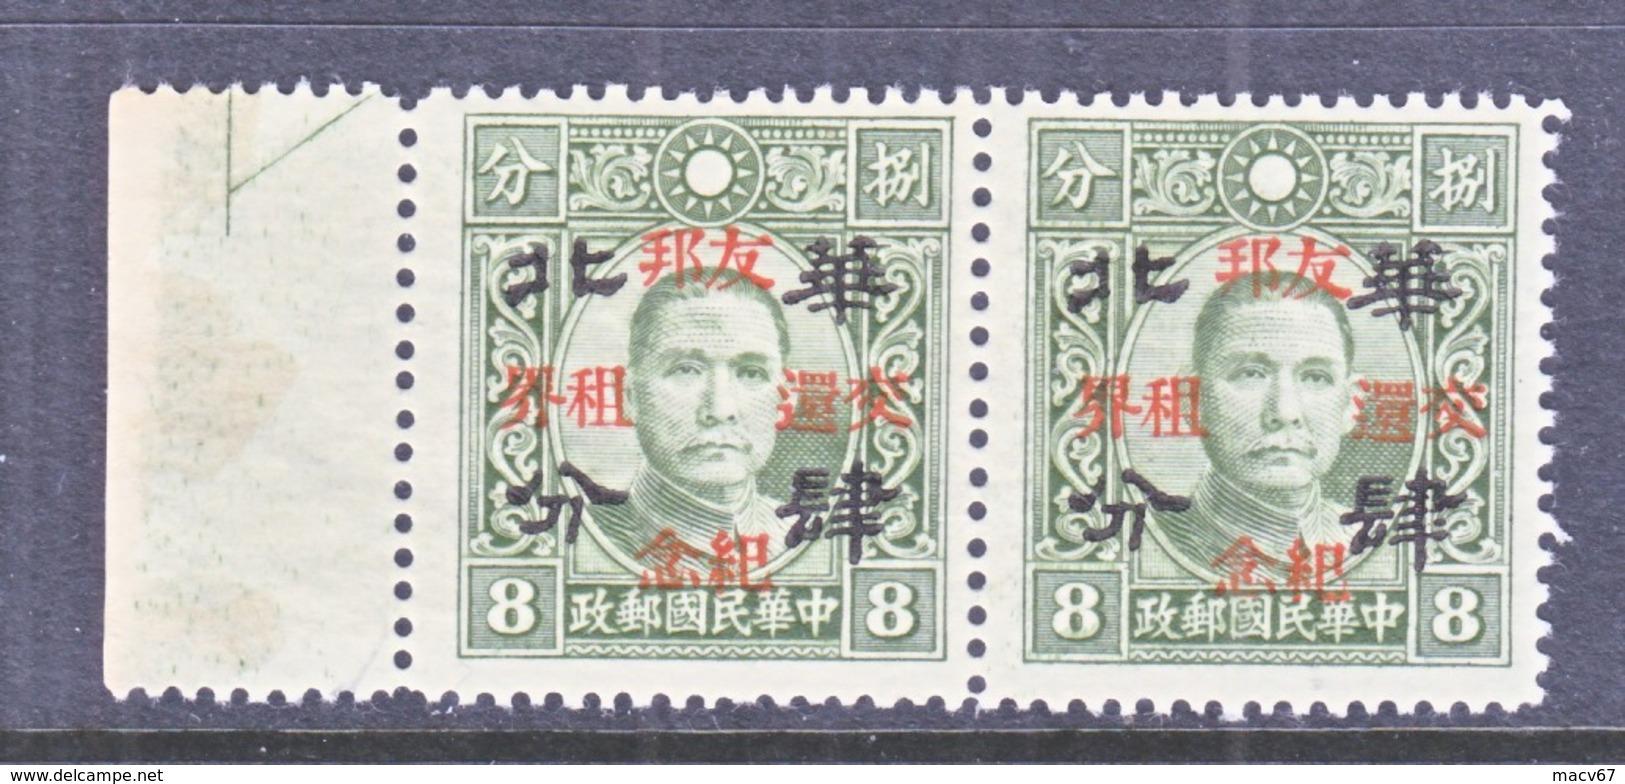 JAPANESE OCCUPATION NORTH CHINA  8 N 55 X 2   **  Perf.  14  No Wmk. - 1941-45 Northern China